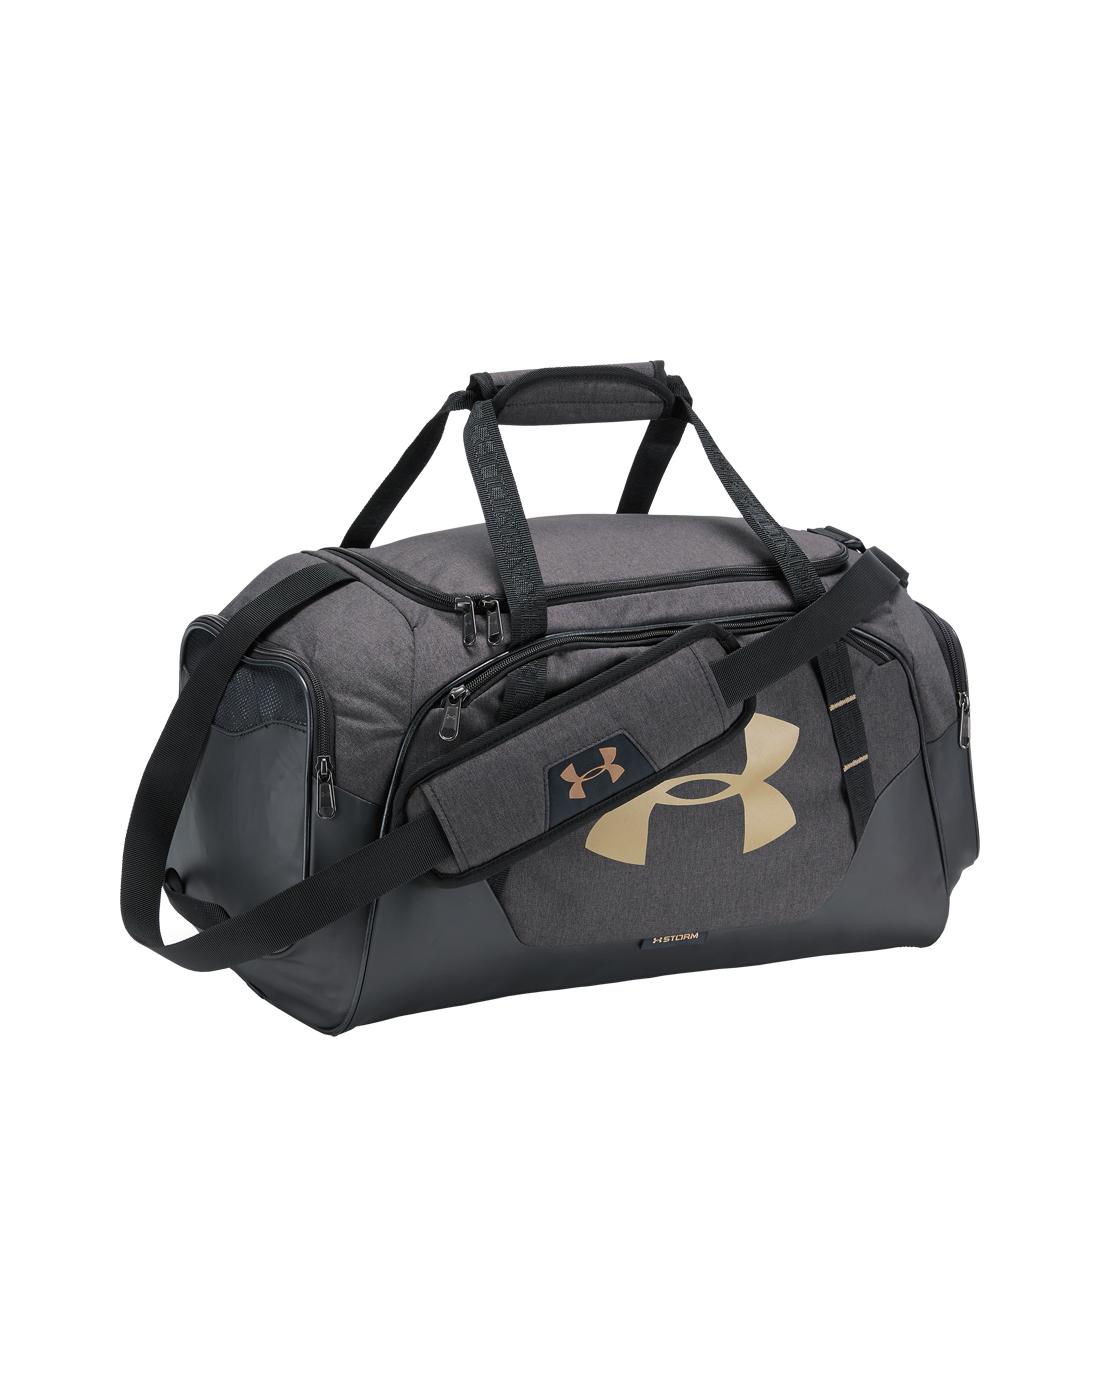 fcd5d0ec17f Under Armour Undeniable Duffel Bag   Black   Life Style Sports